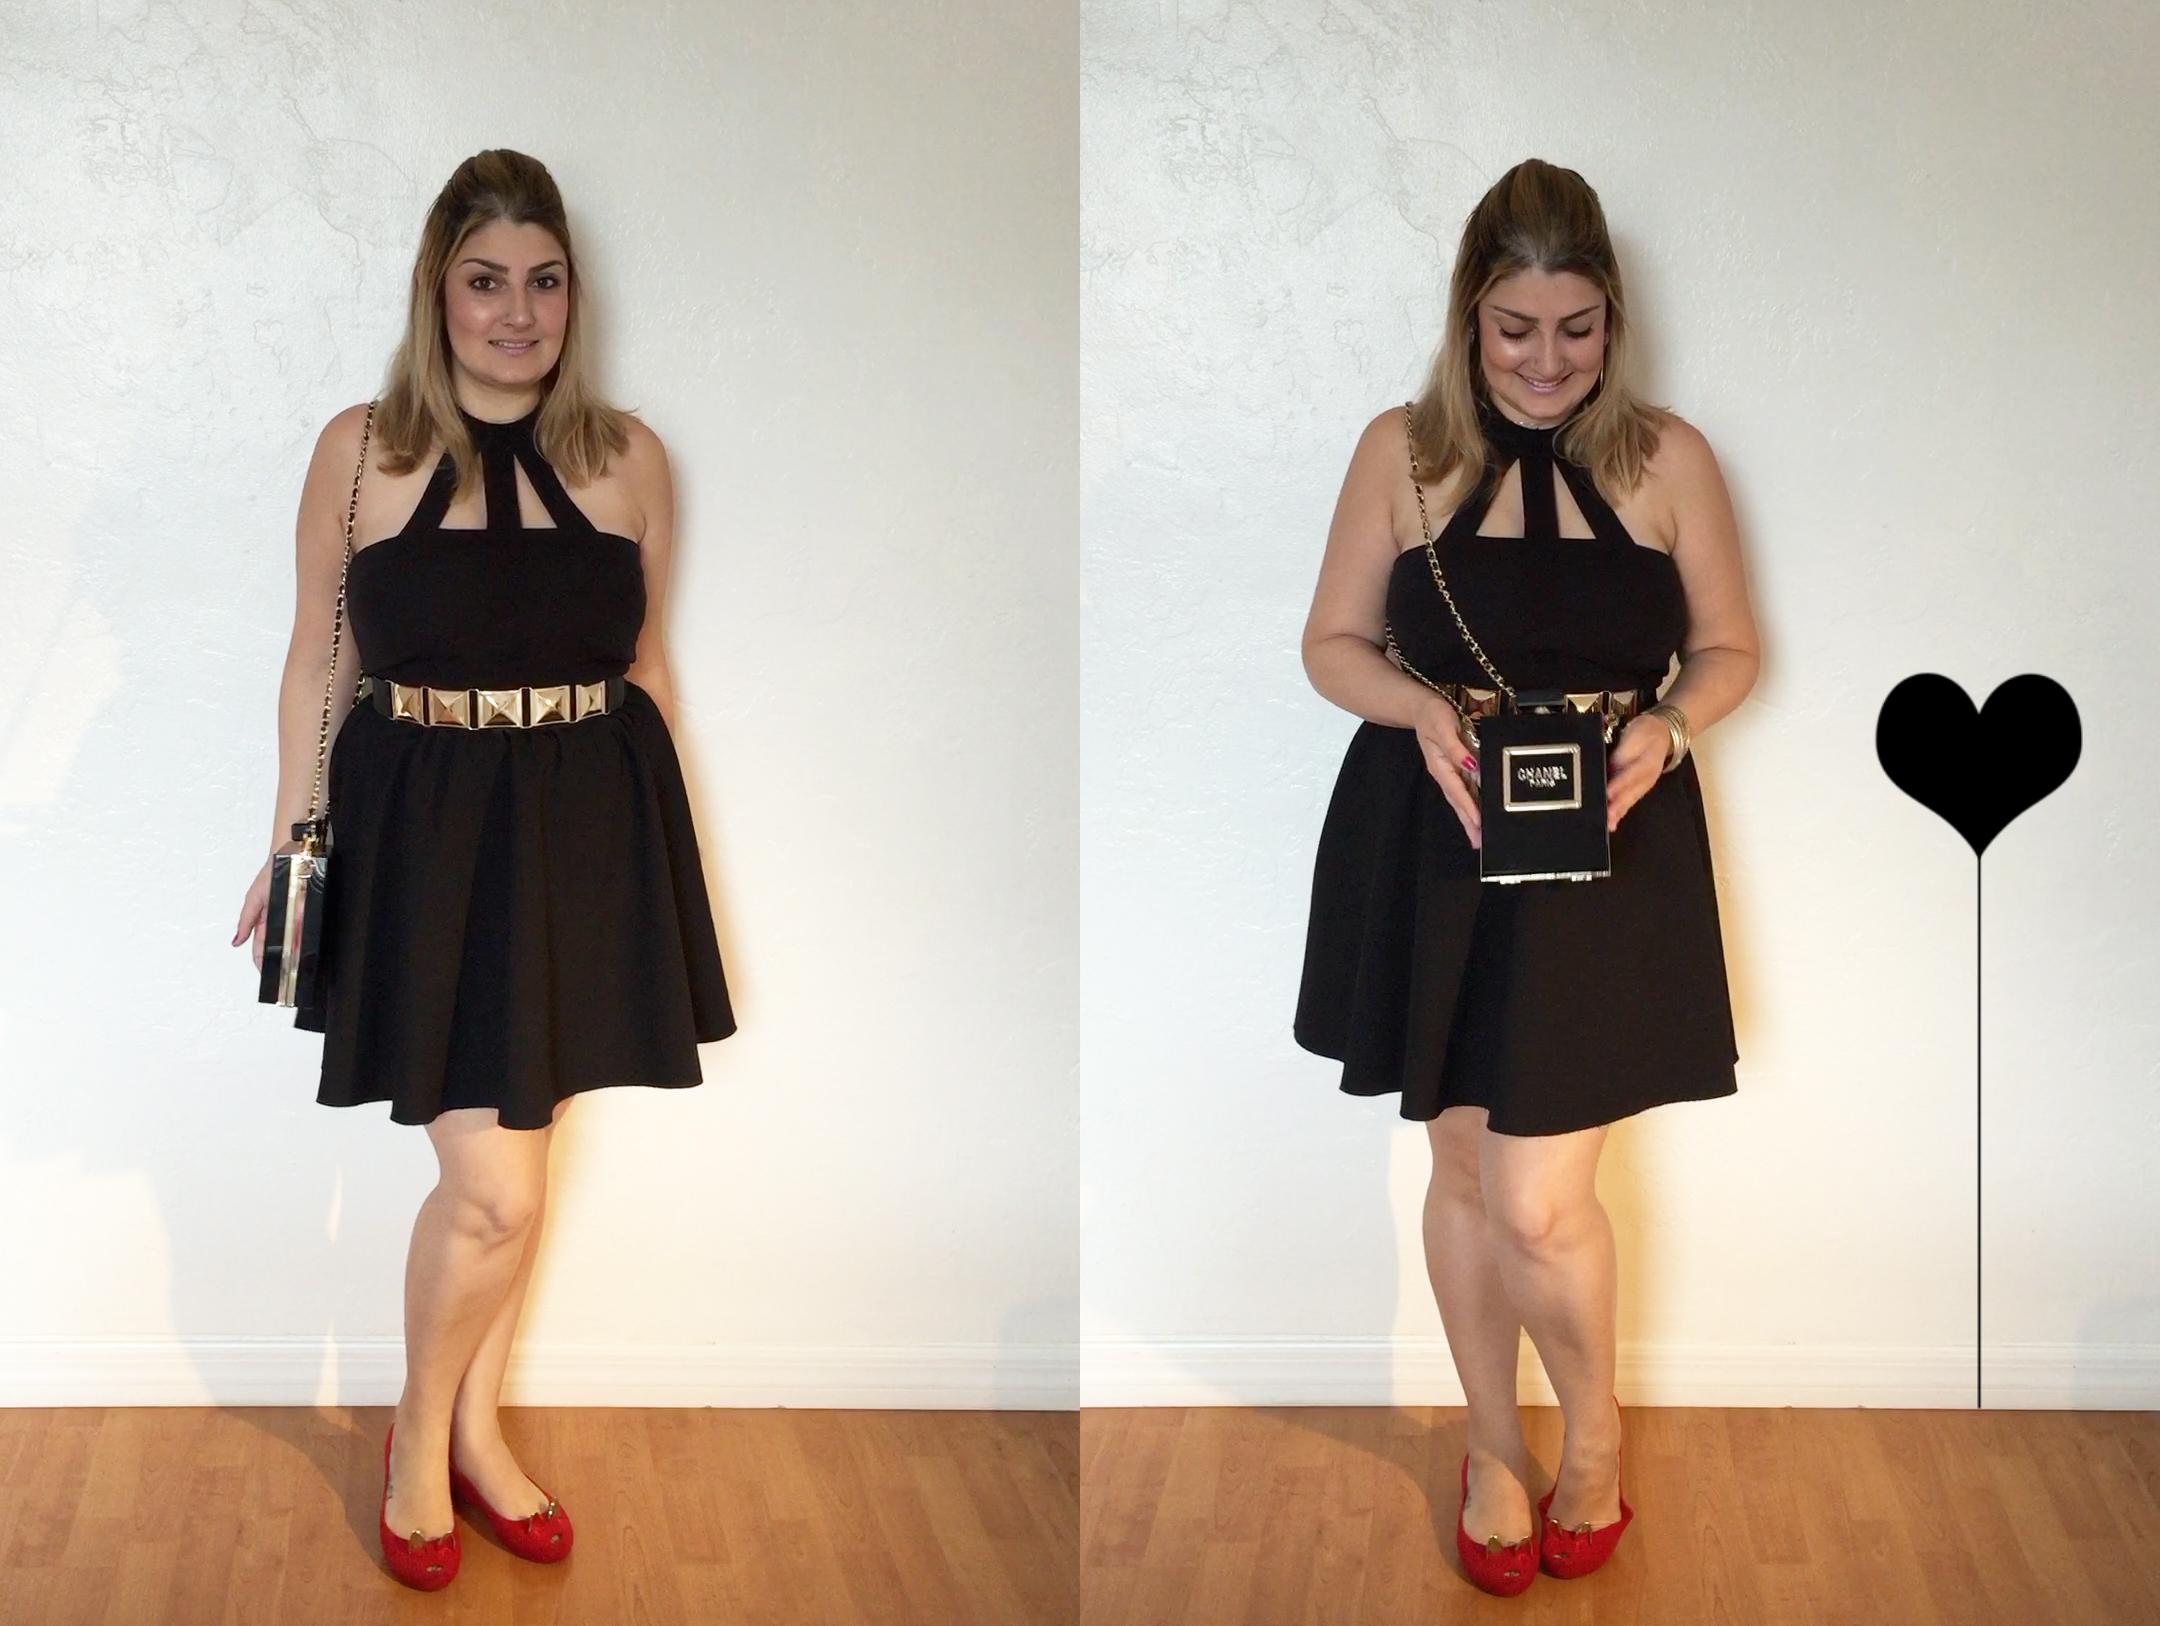 blogueira de moda, giovana quaglio, acho tendencia, look, saia rodada, recortes, bolsa, chanel, perfume. melissa, gatinho